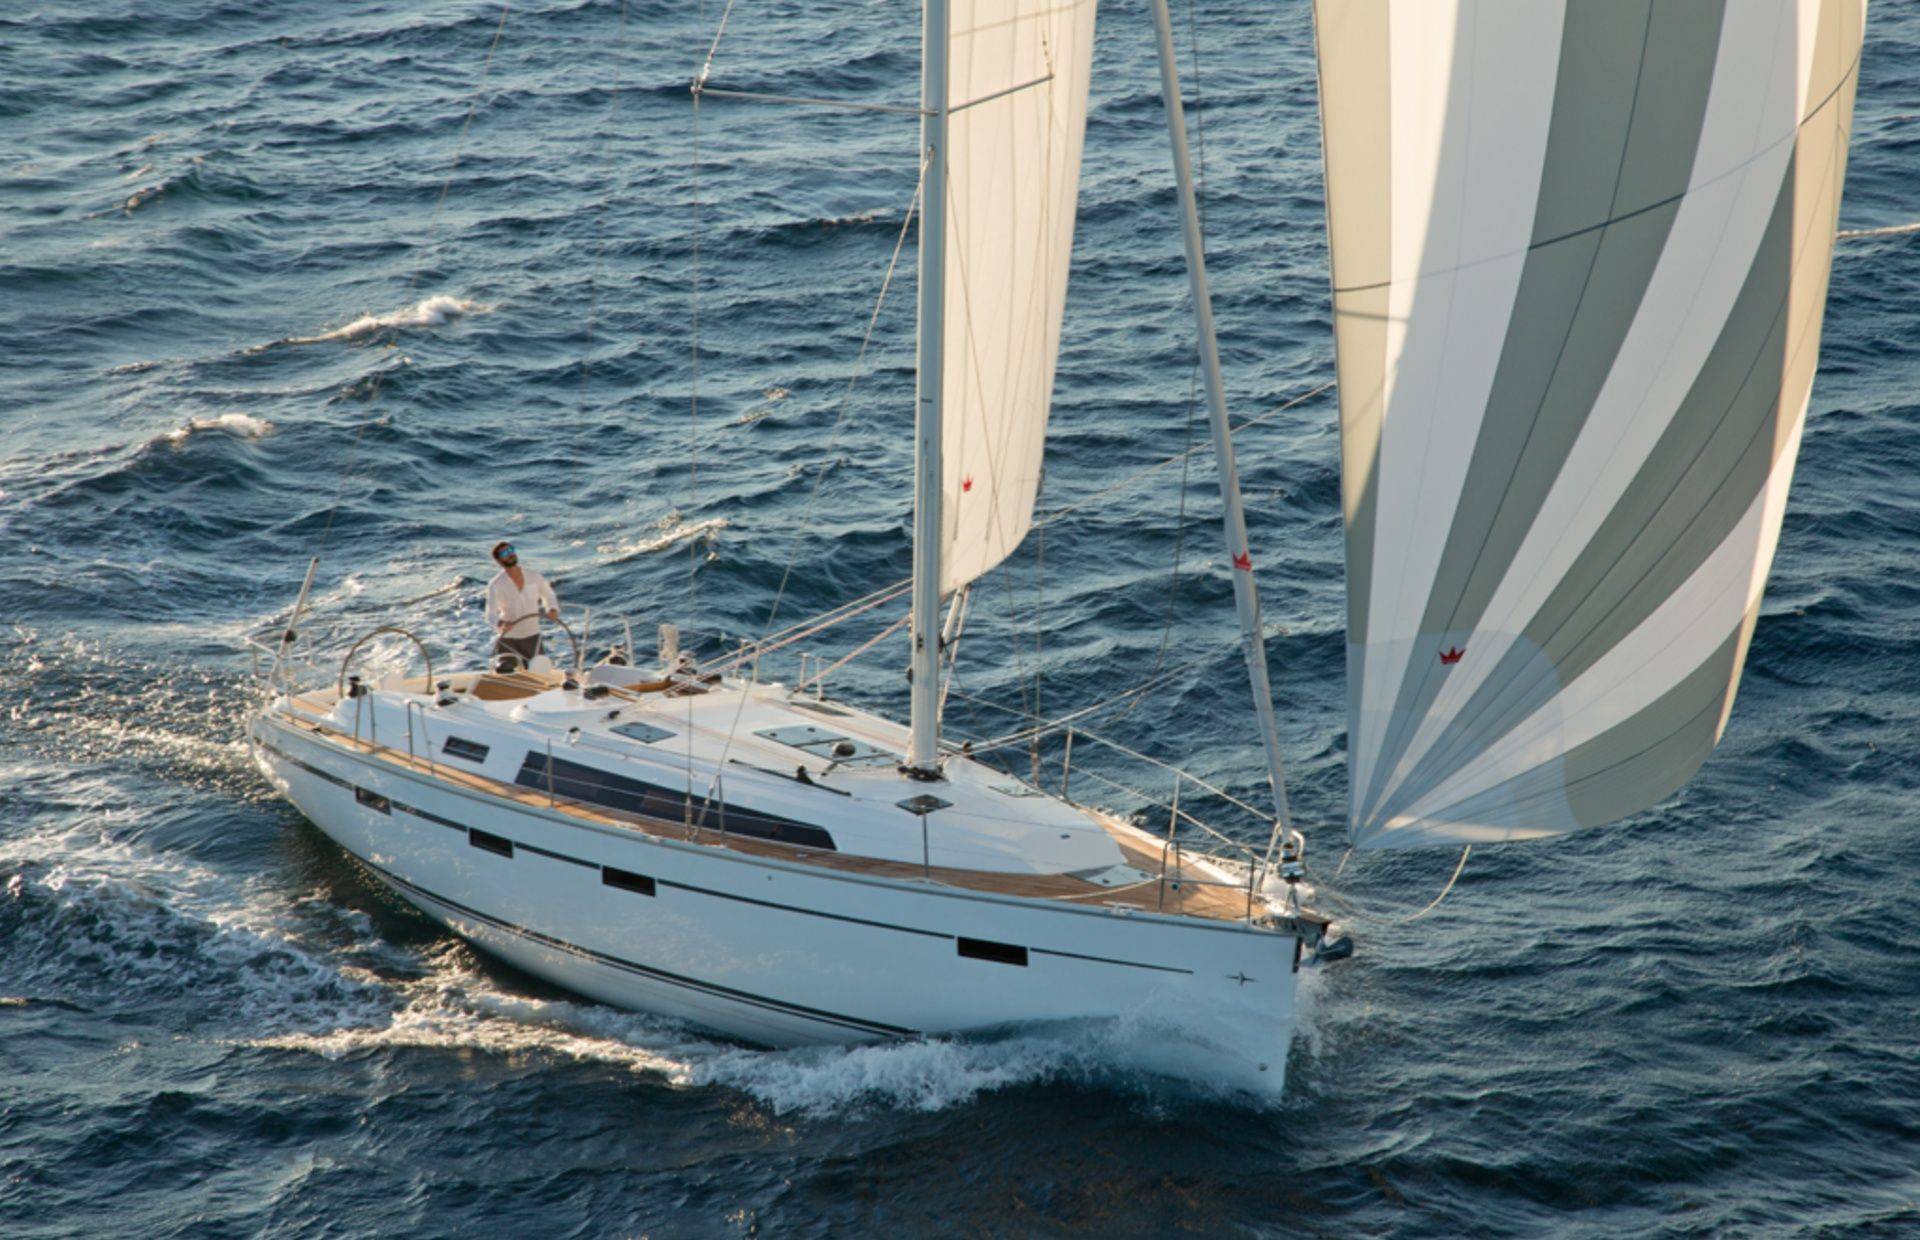 https://media.insailing.com/boat/adriatic-challenge/image_1568992343325.jpg